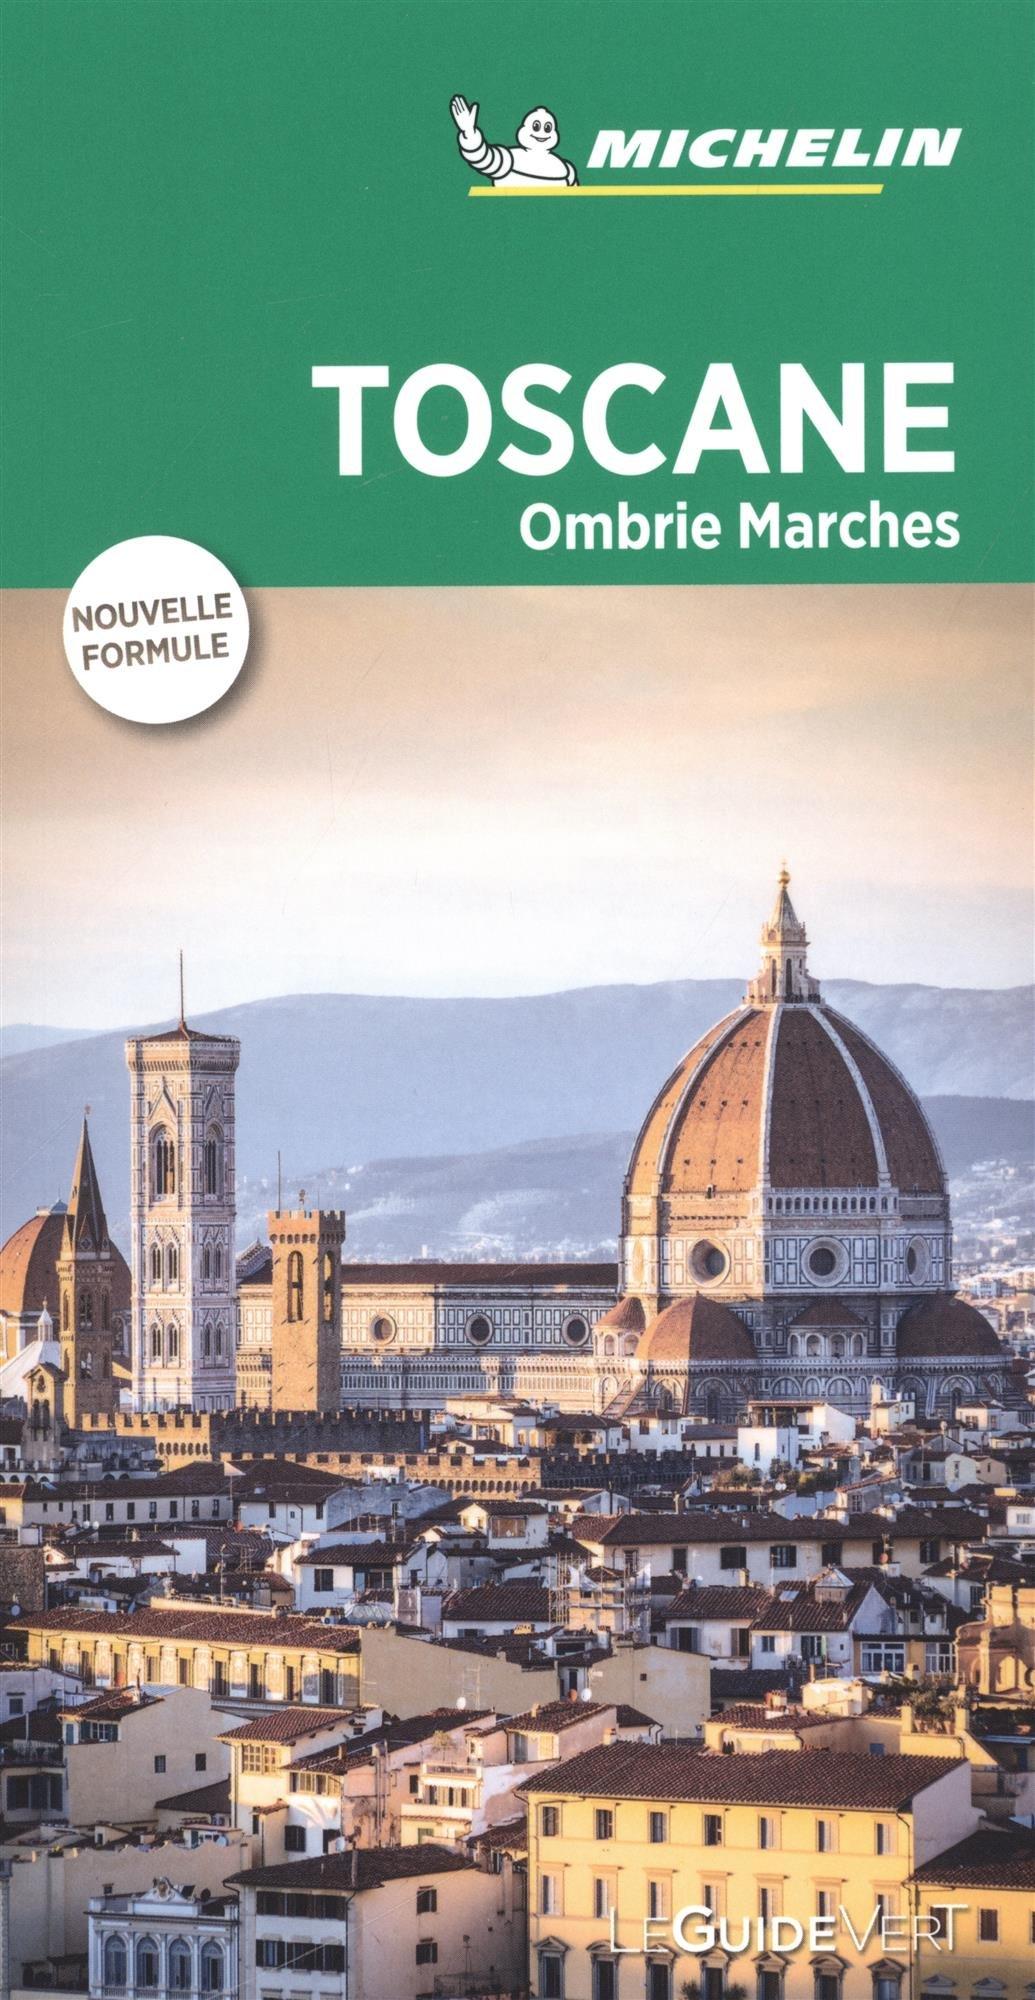 Guide Vert Toscane, Ombrie Michelin Broché – 10 février 2018 2067227068 GEOGRAFIA GENERALE. VIAGGI Guide turistiche-Italia Voyages / Guides touristiques